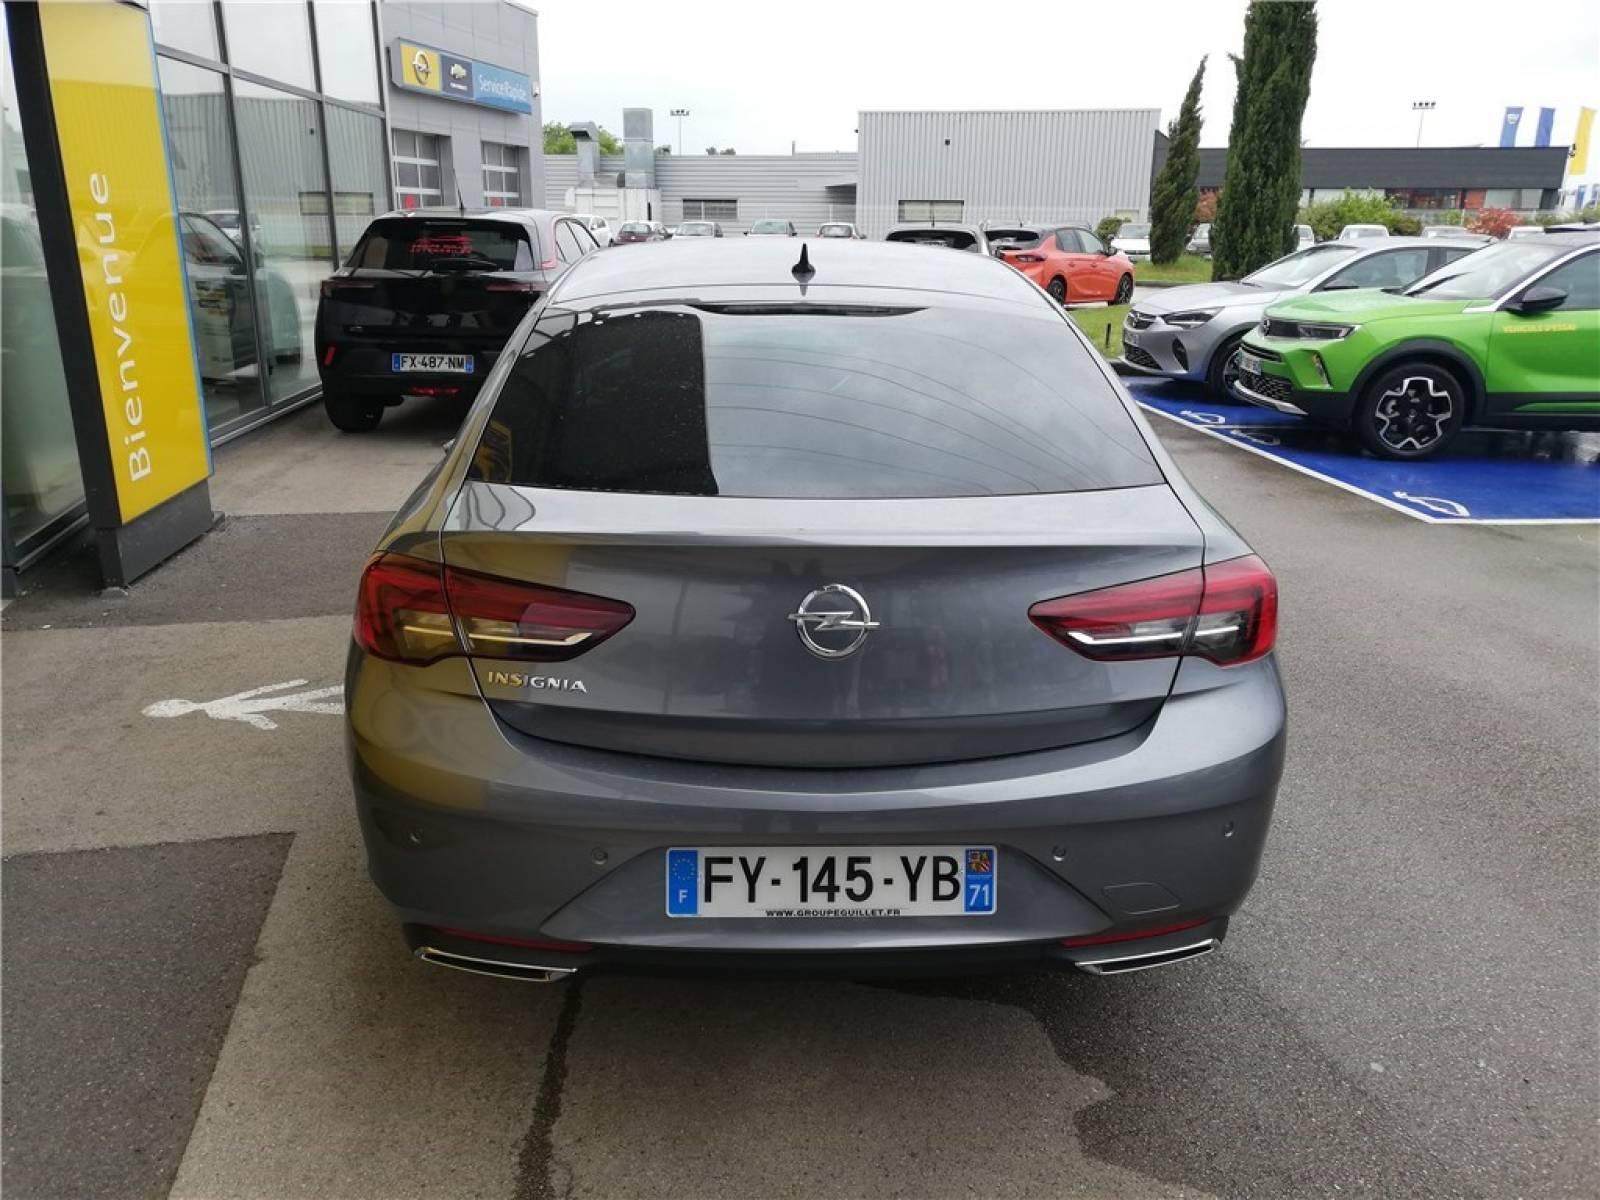 OPEL Insignia Grand Sport 2.0 Diesel 174 ch BVA8 - véhicule d'occasion - Groupe Guillet - Opel Magicauto - Chalon-sur-Saône - 71380 - Saint-Marcel - 6